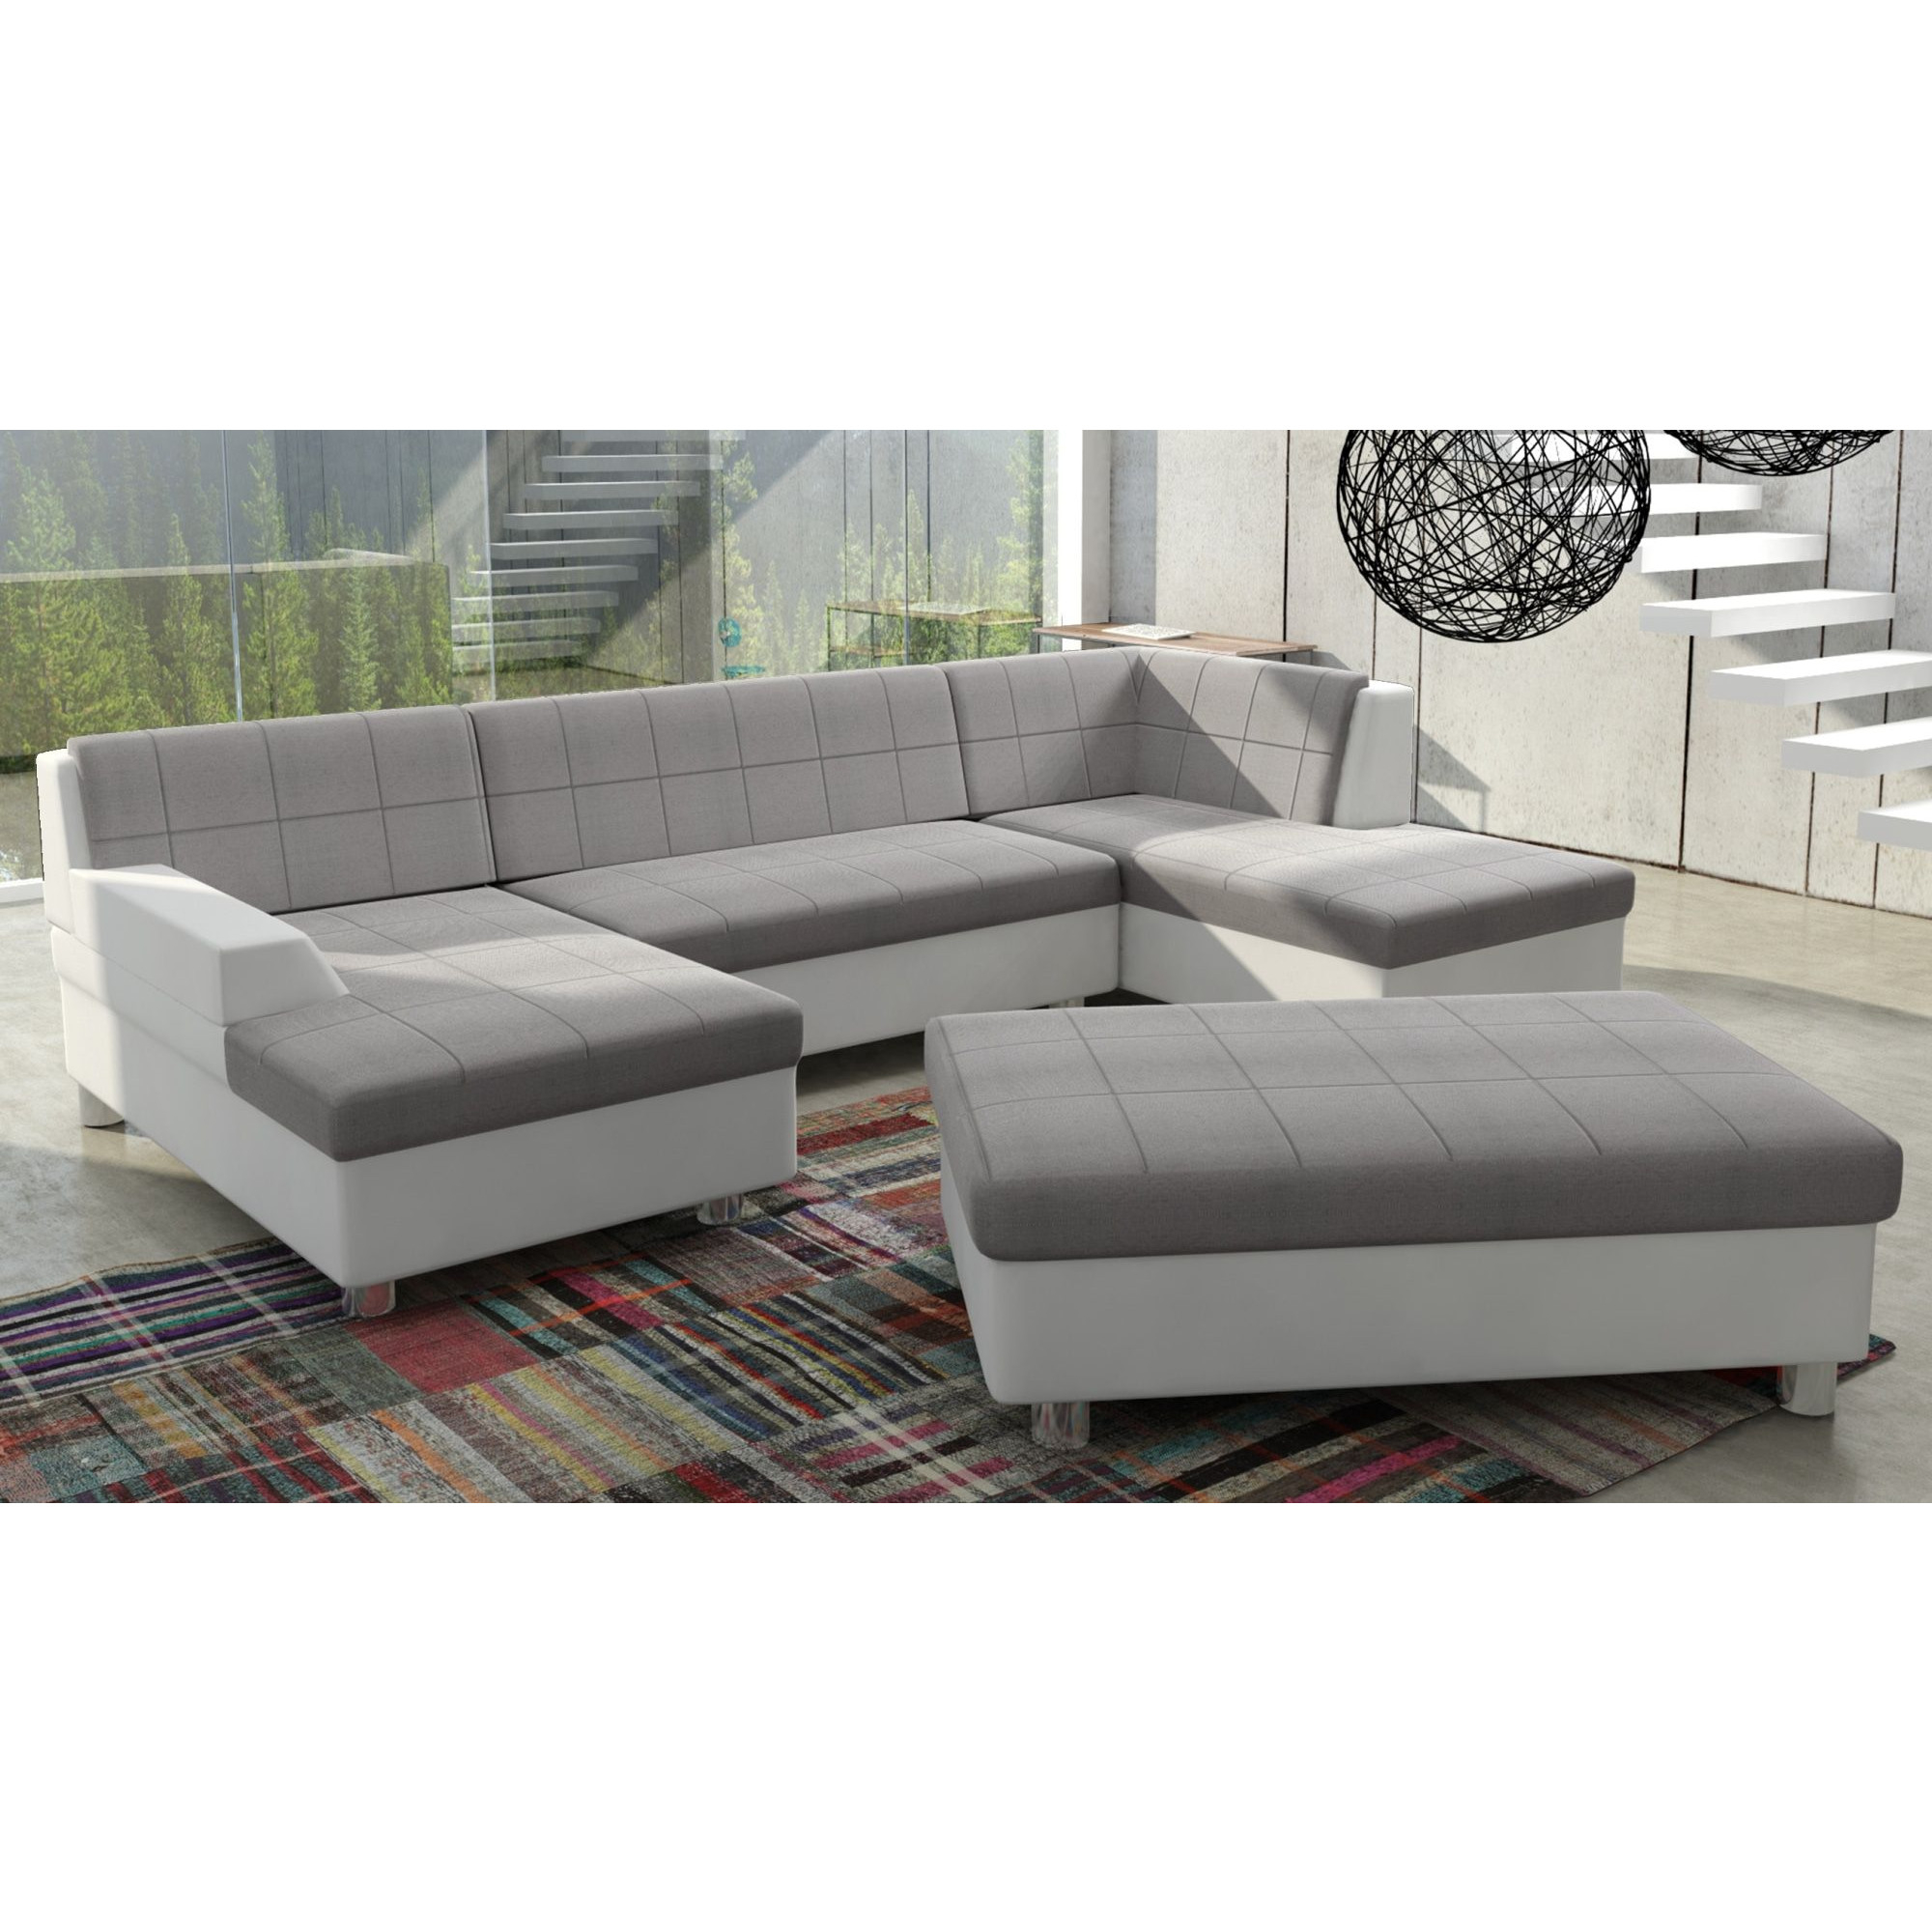 Canapé d angle panoramique design avec méri nne gauche